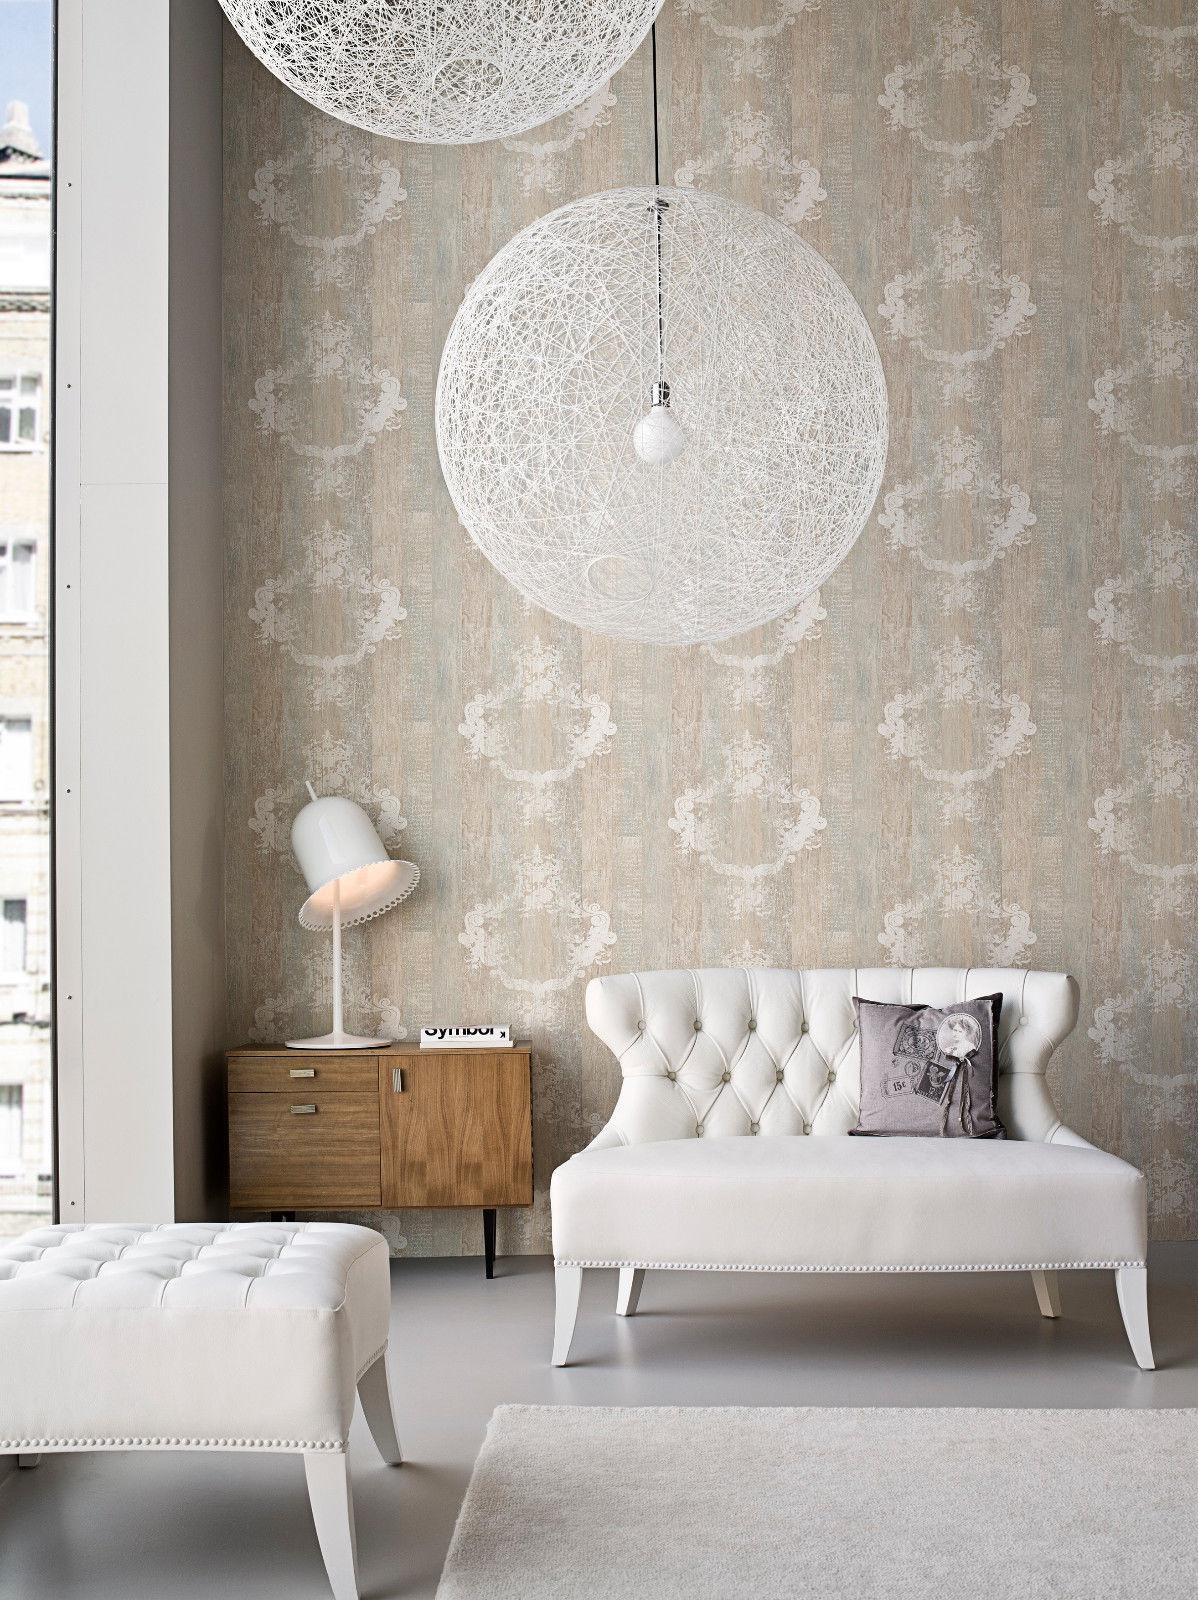 vlies tapete antik holz muster ornament barock braun grau. Black Bedroom Furniture Sets. Home Design Ideas